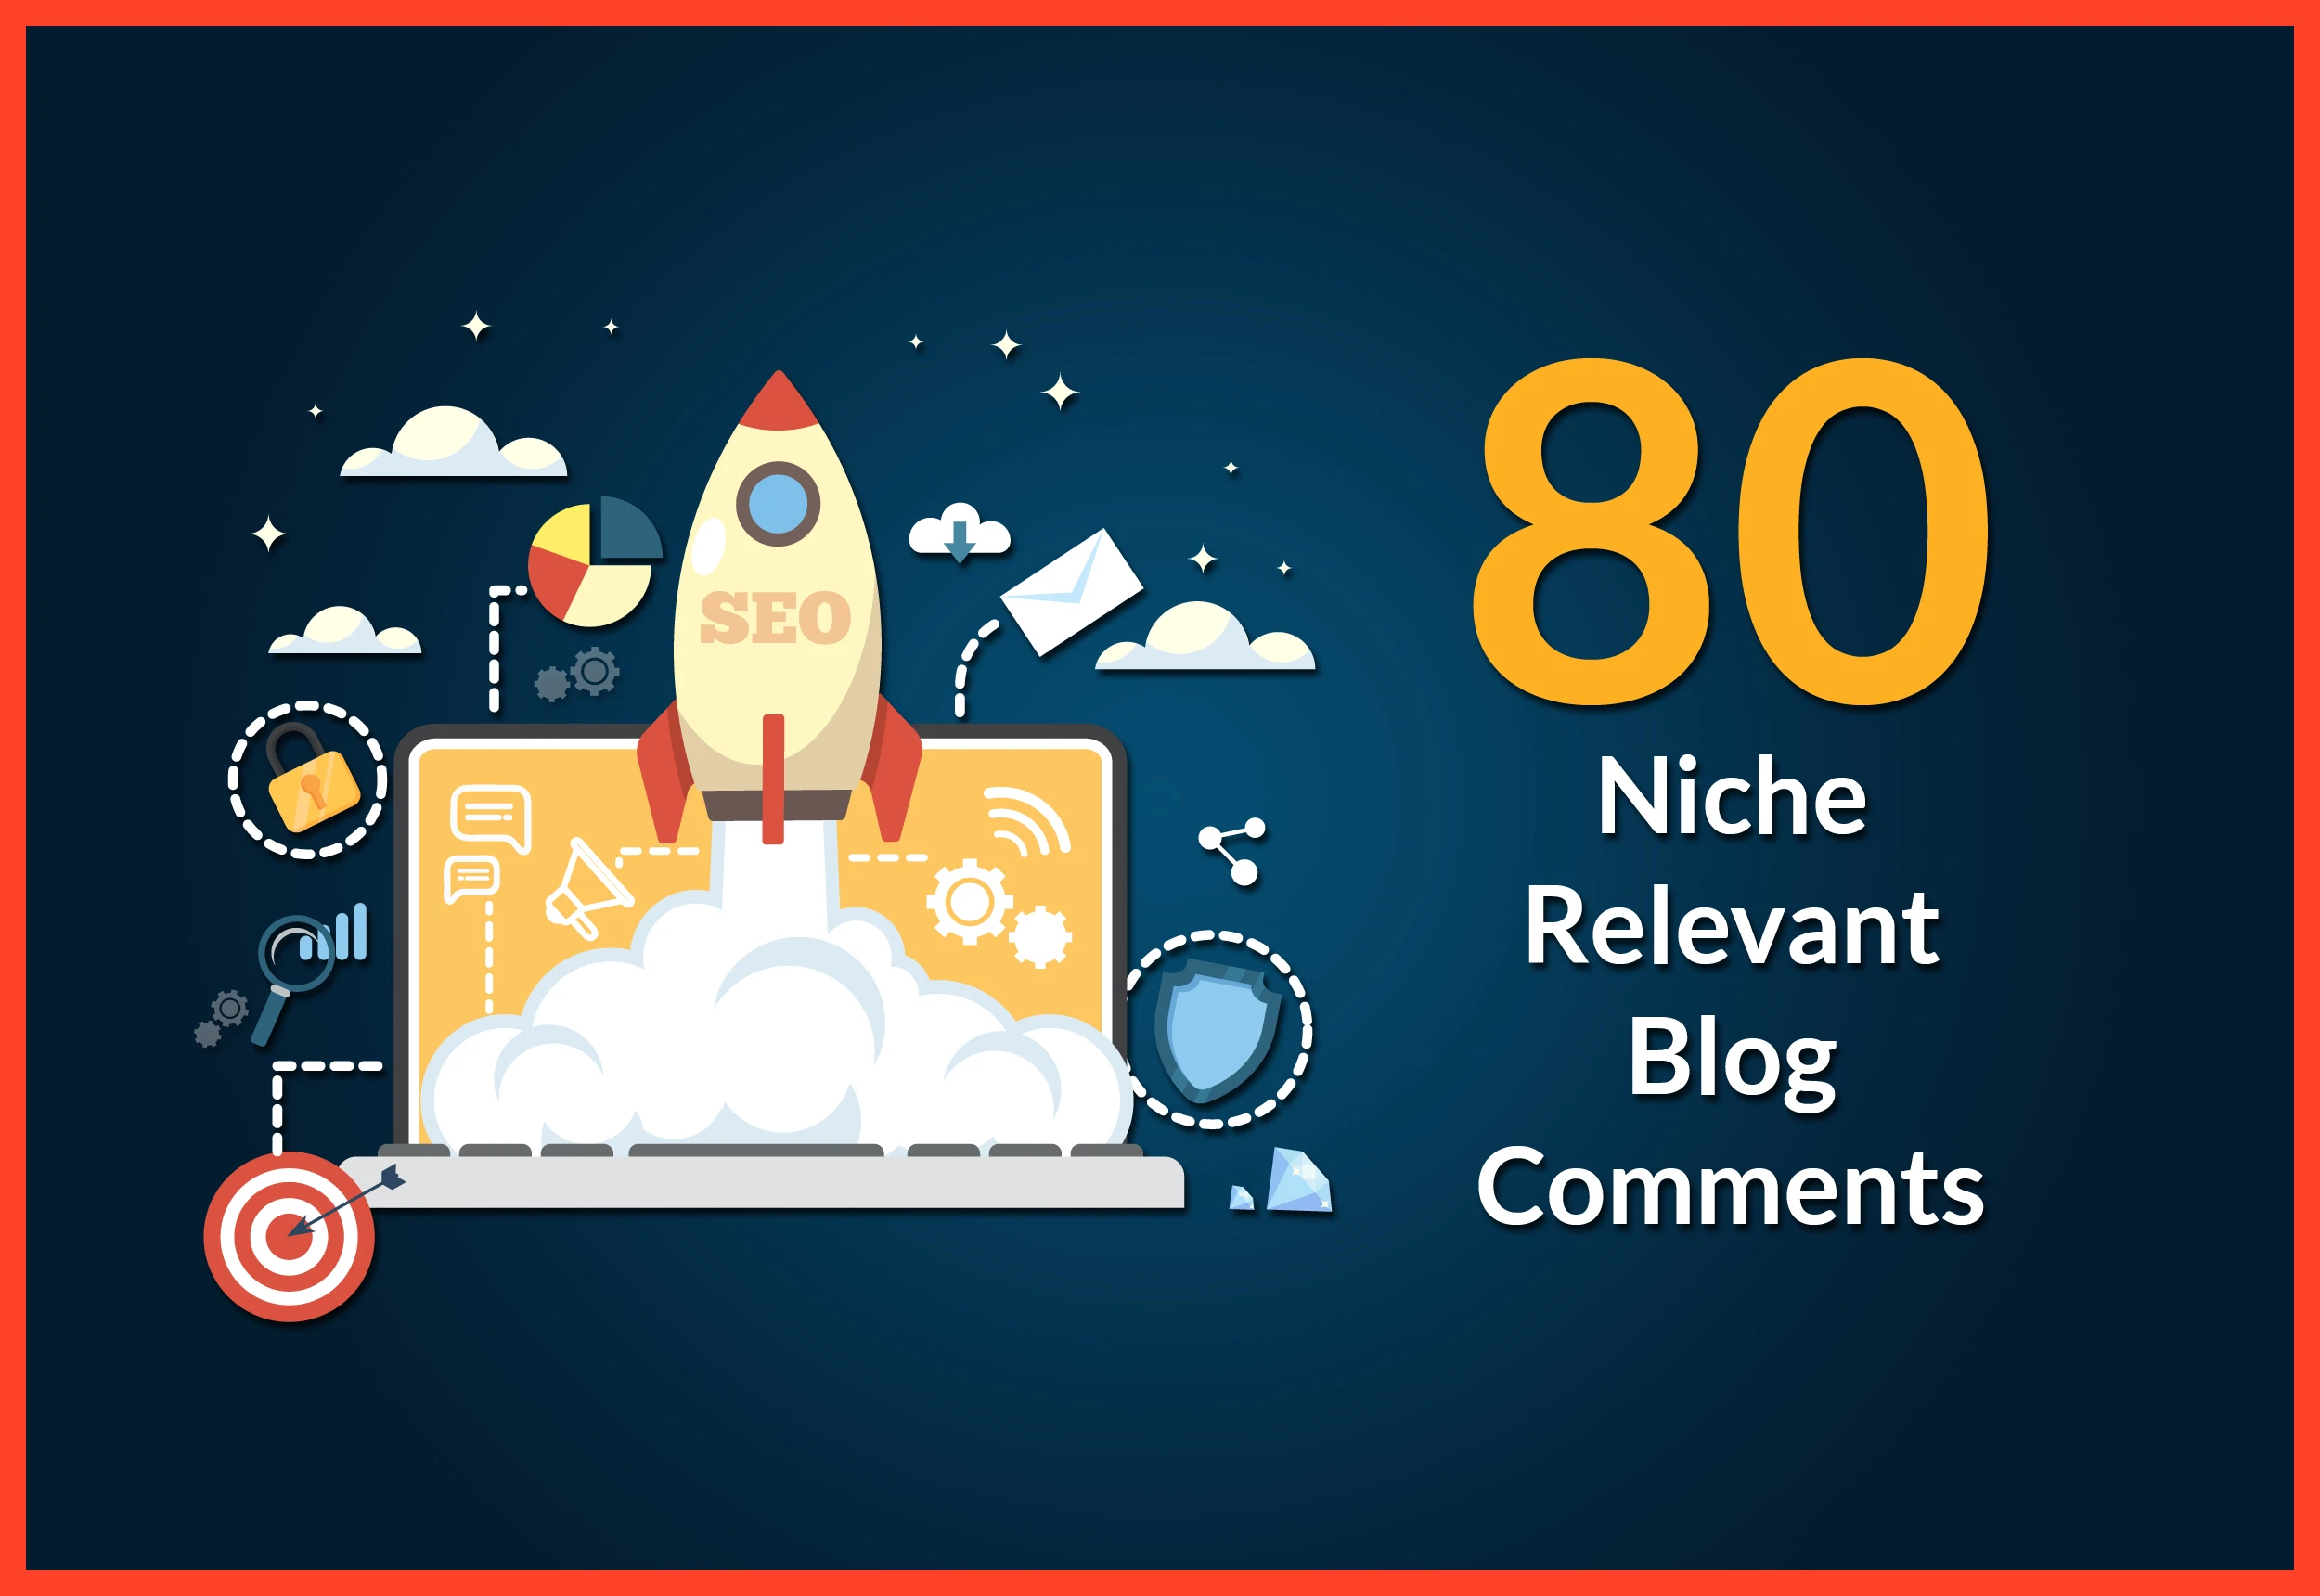 i will provide 80 niche Relevant blog comments high da pa Google ranking